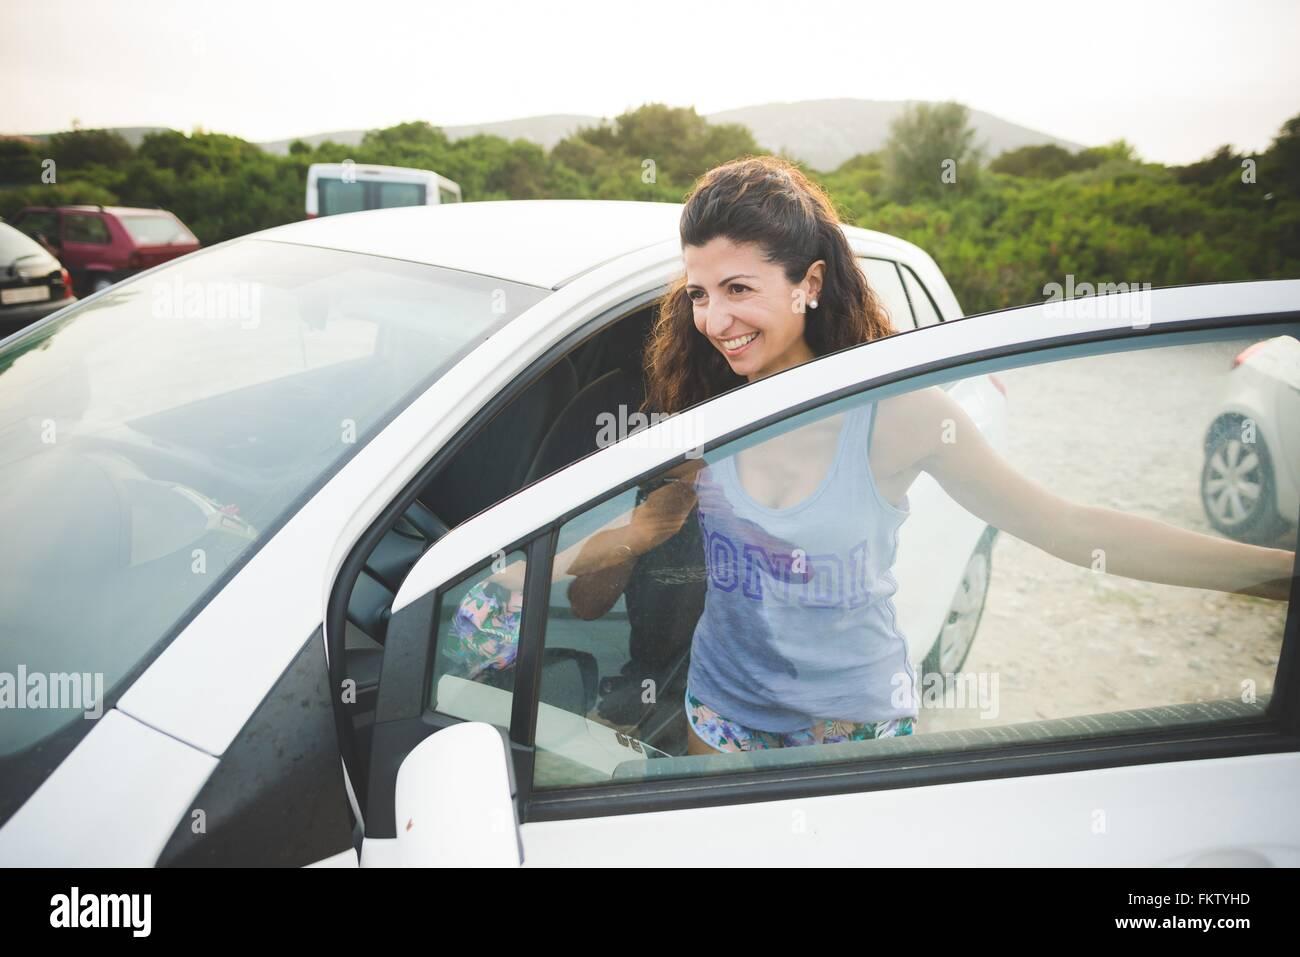 Getting Into Car Stockfotos Amp Getting Into Car Bilder Alamy